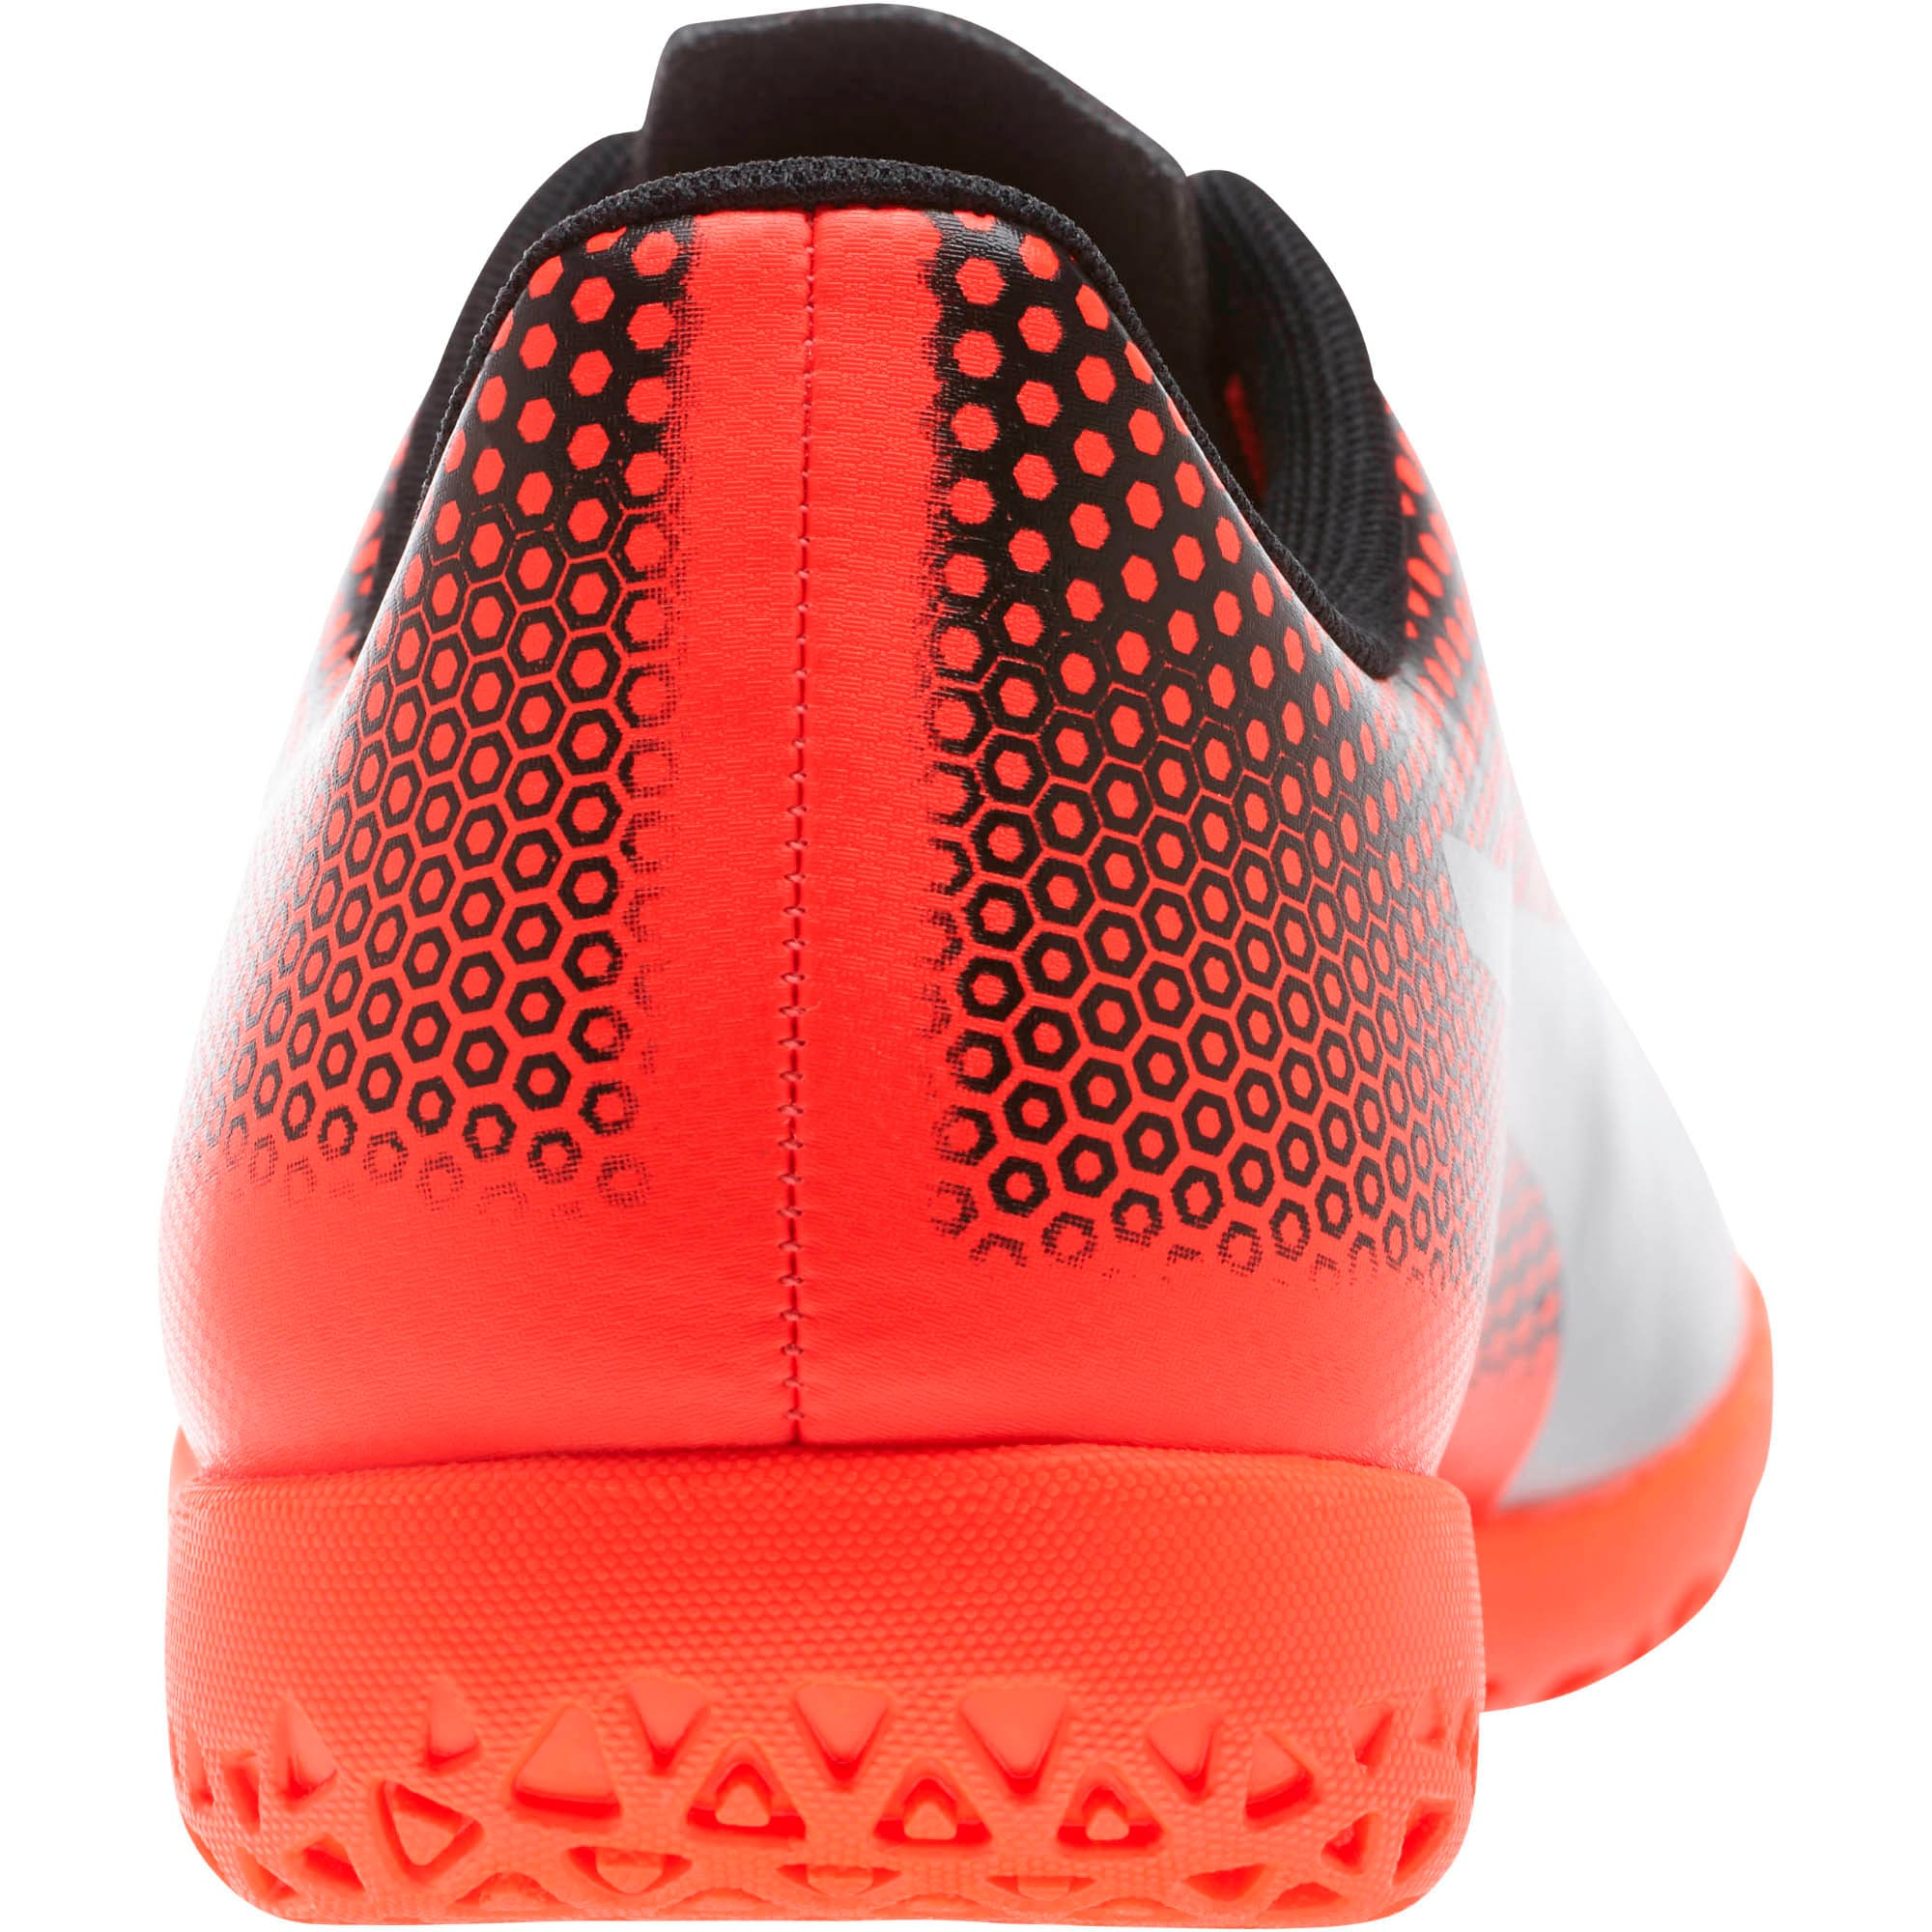 Thumbnail 4 of PUMA Spirit IT Men's Soccer Shoes, Red-Silver-Black, medium